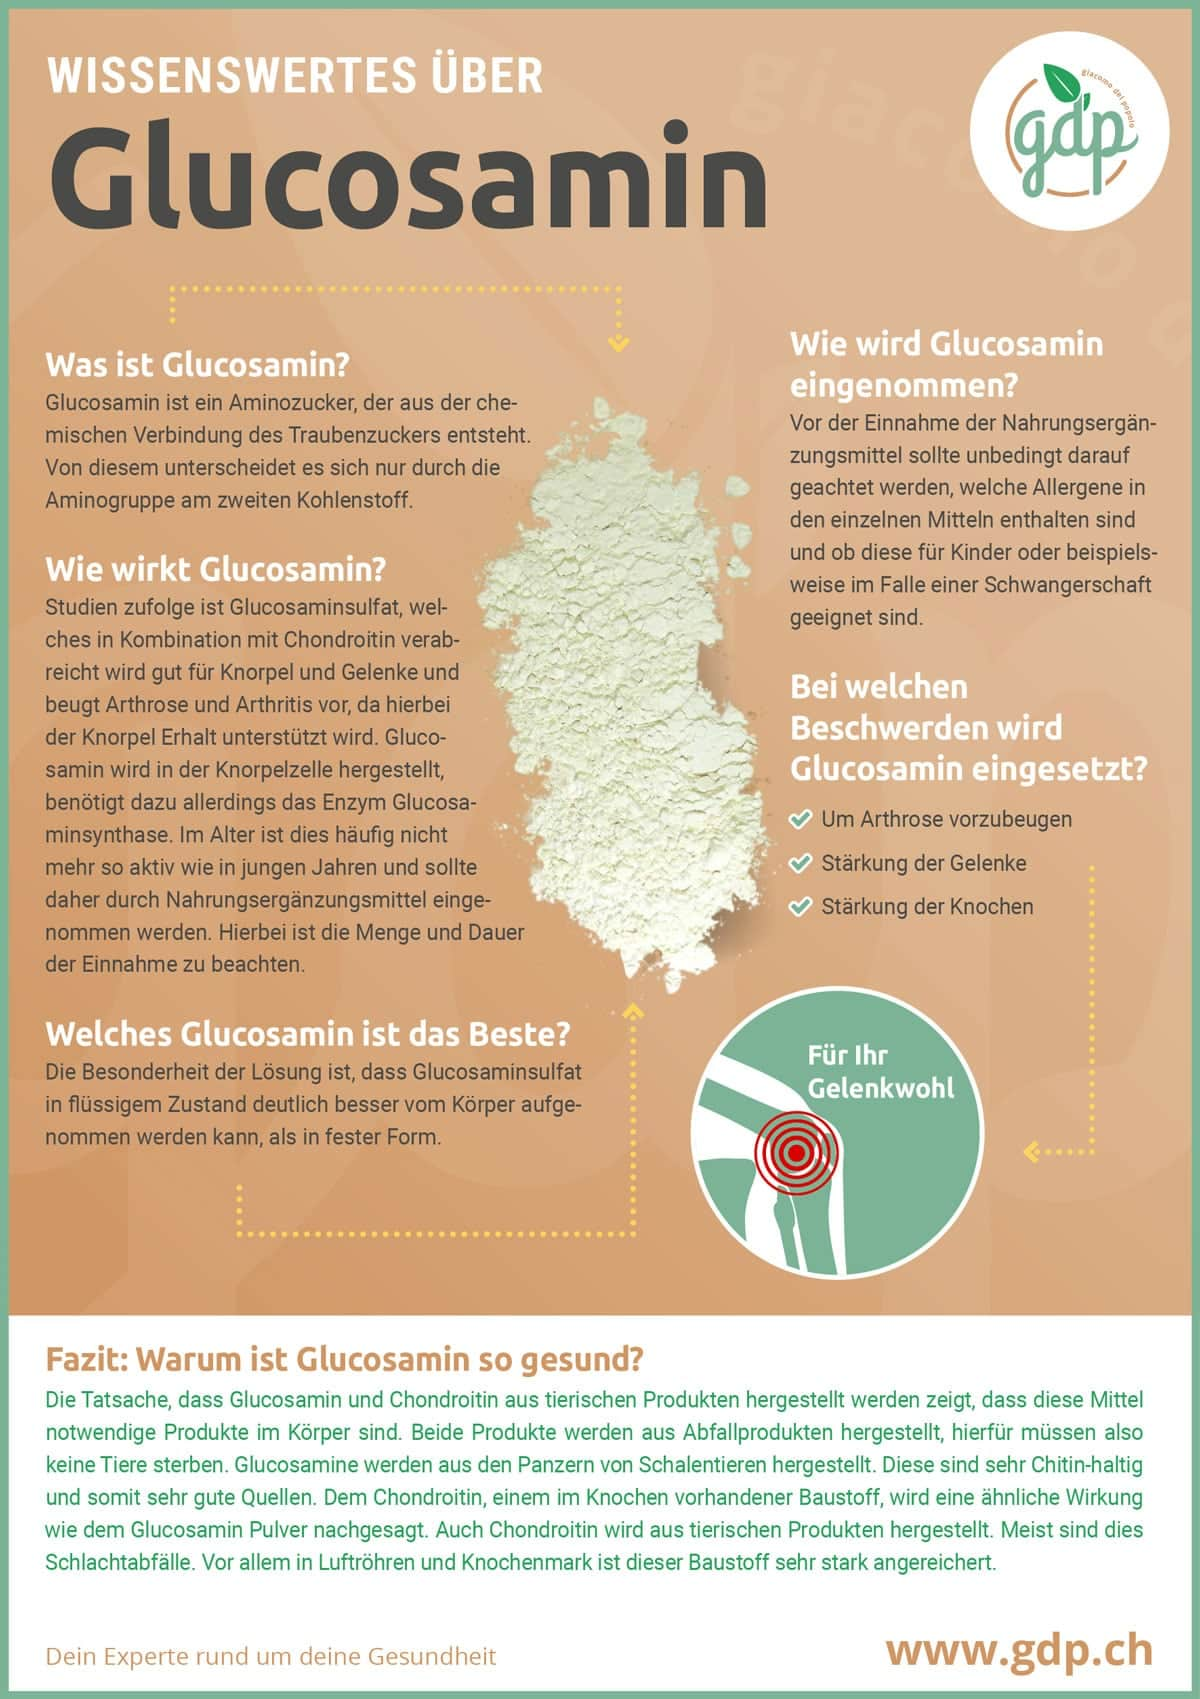 Glucosamin Infografik